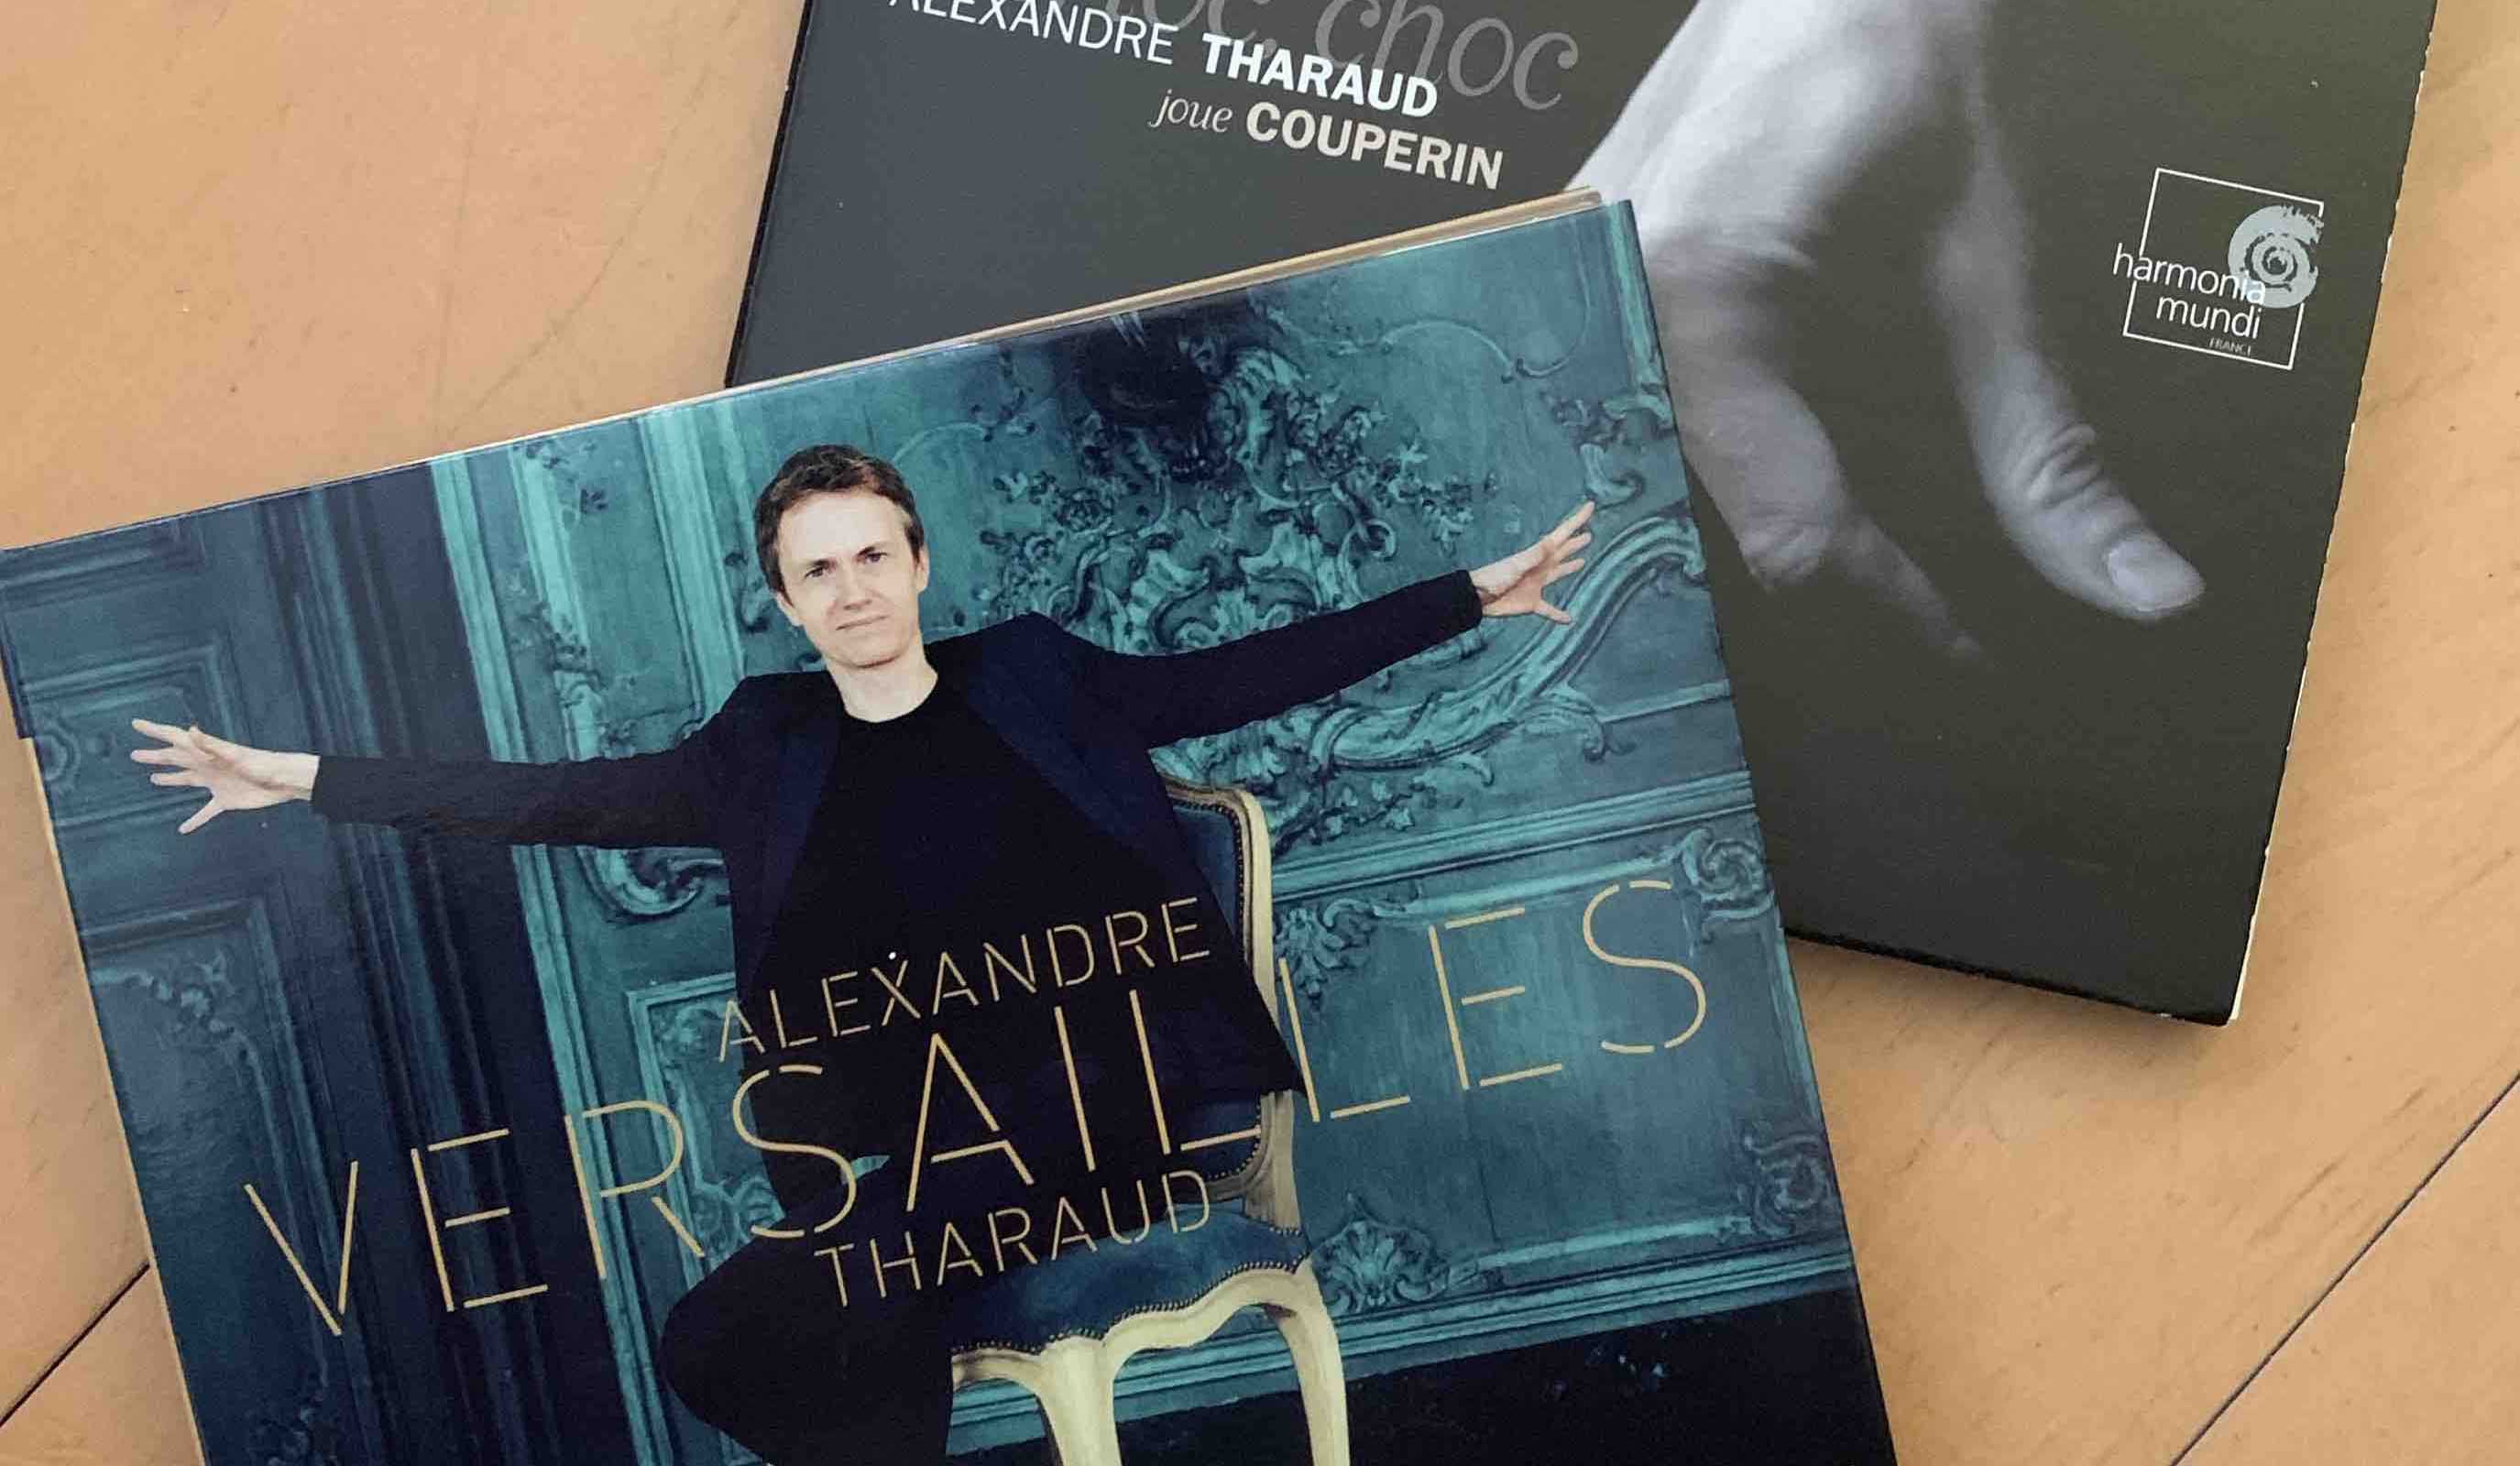 『VERSAILLES(ヴェルサイユ)』(ERATO、輸入盤)と『Tic toc choc(ティク、トク、ショク)』(Harmonia Mundi、輸入盤)